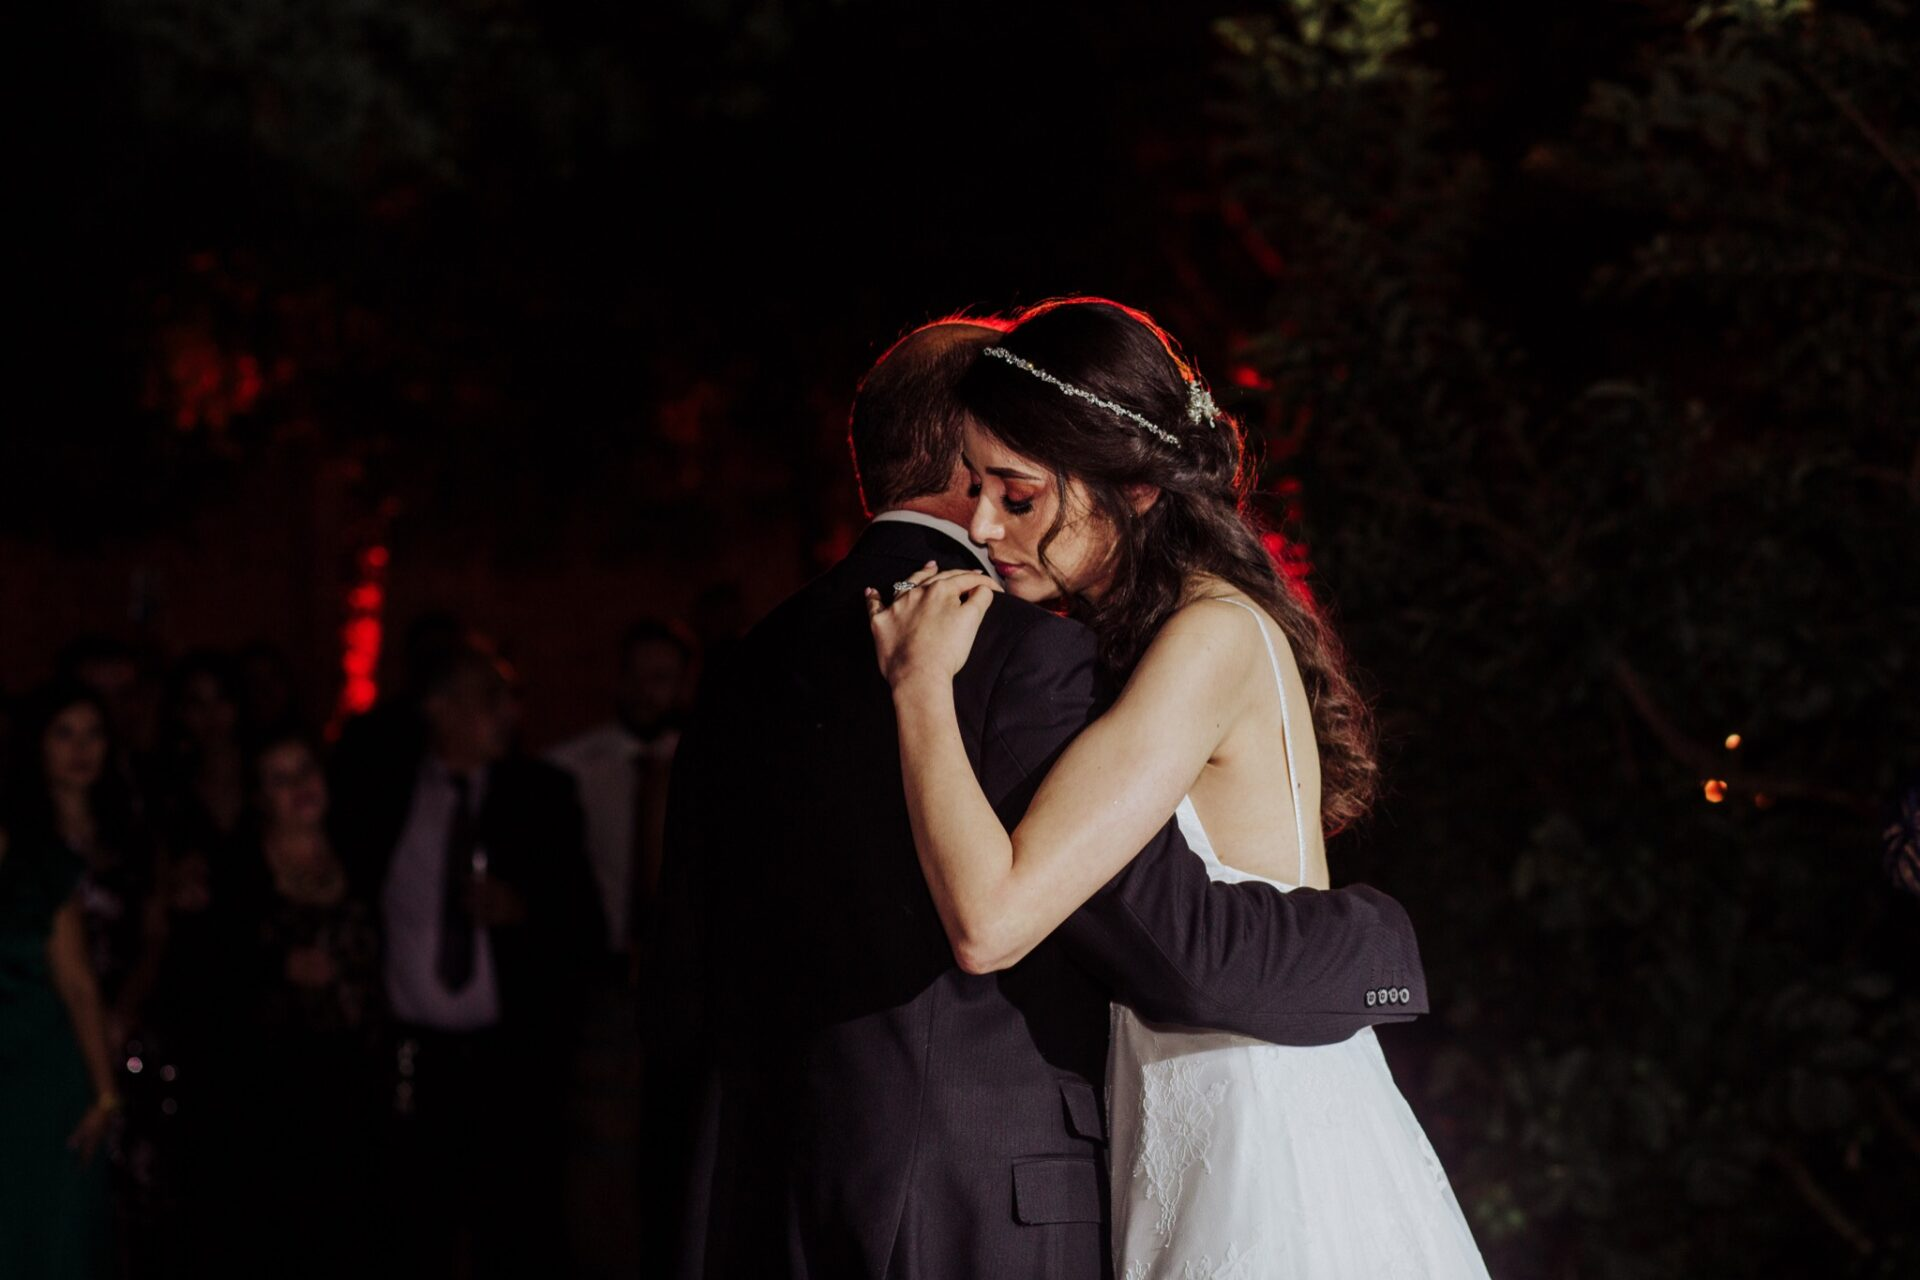 javier_noriega_fotografo_bodas_teul_zacatecas_wedding_photographer35